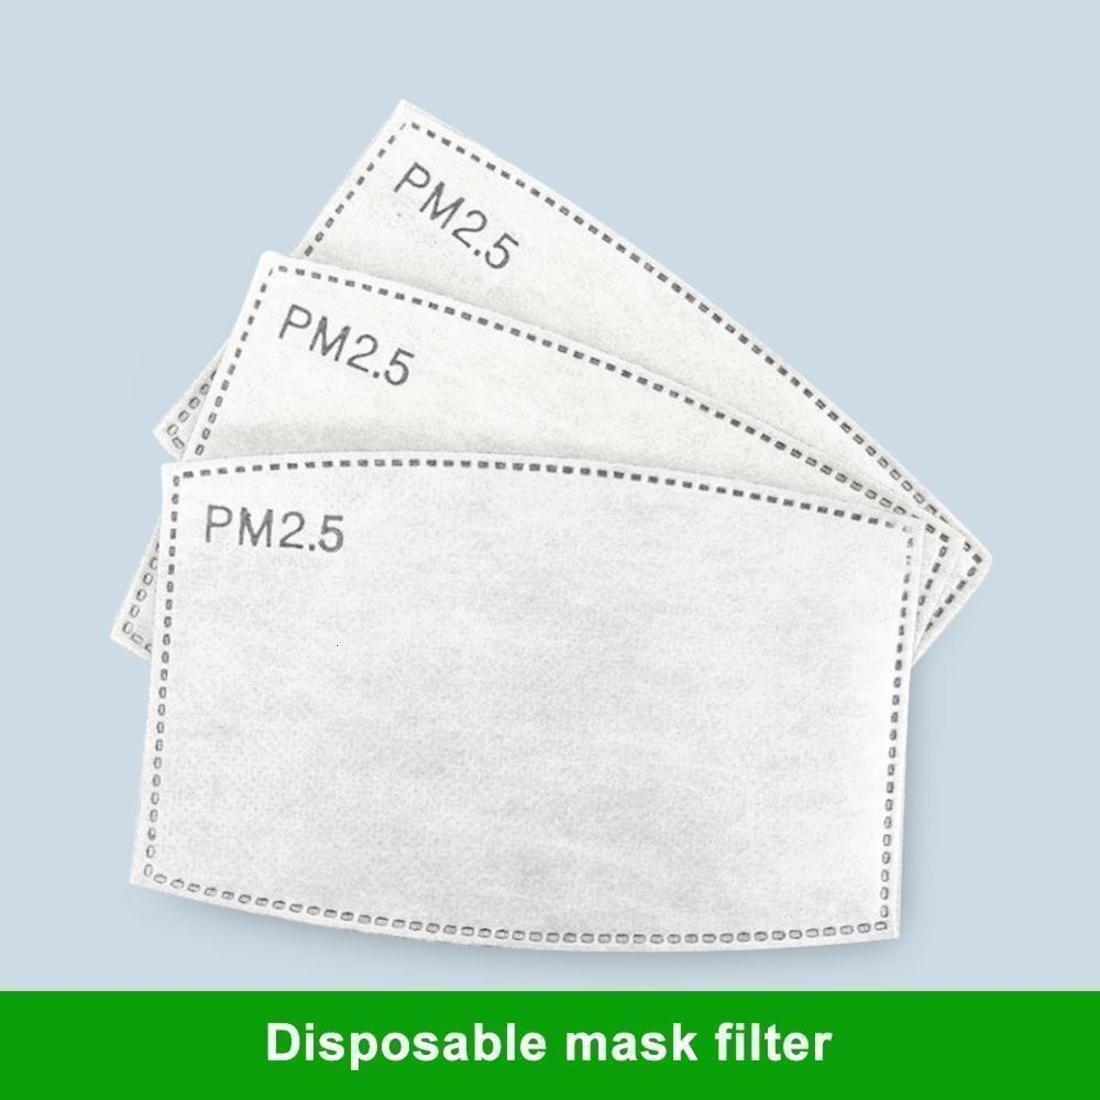 PM2.5 Bodhehigh Quality 2021Respiratore Polvere Bocca Face Mask Commercio all'ingrosso smog inquinamento atmosferico lavabile BEU5